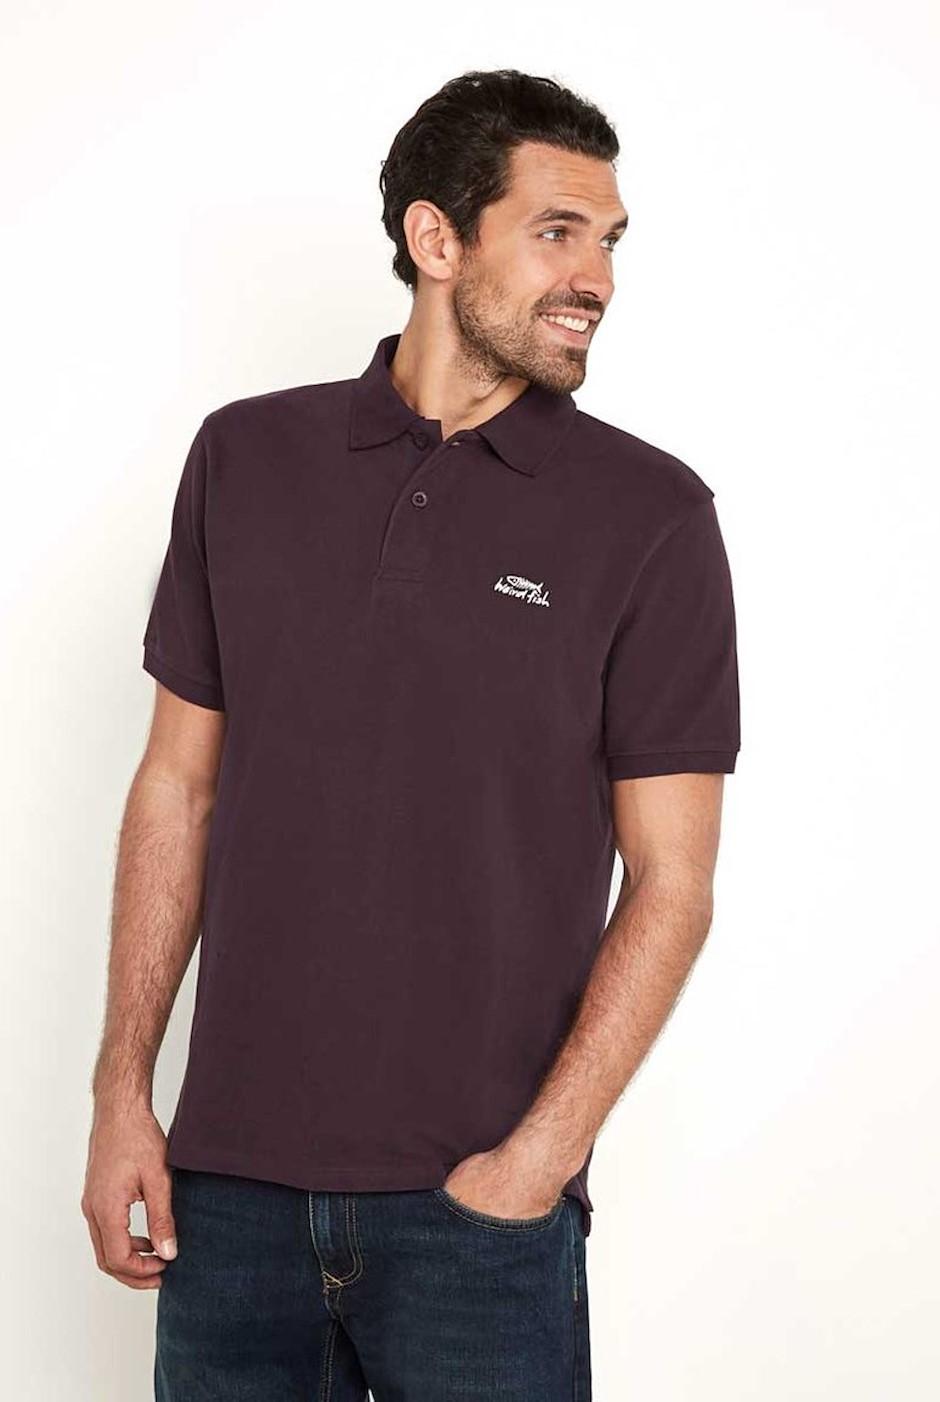 Saltash Rib Collar Pique Polo Shirt Mulled Wine